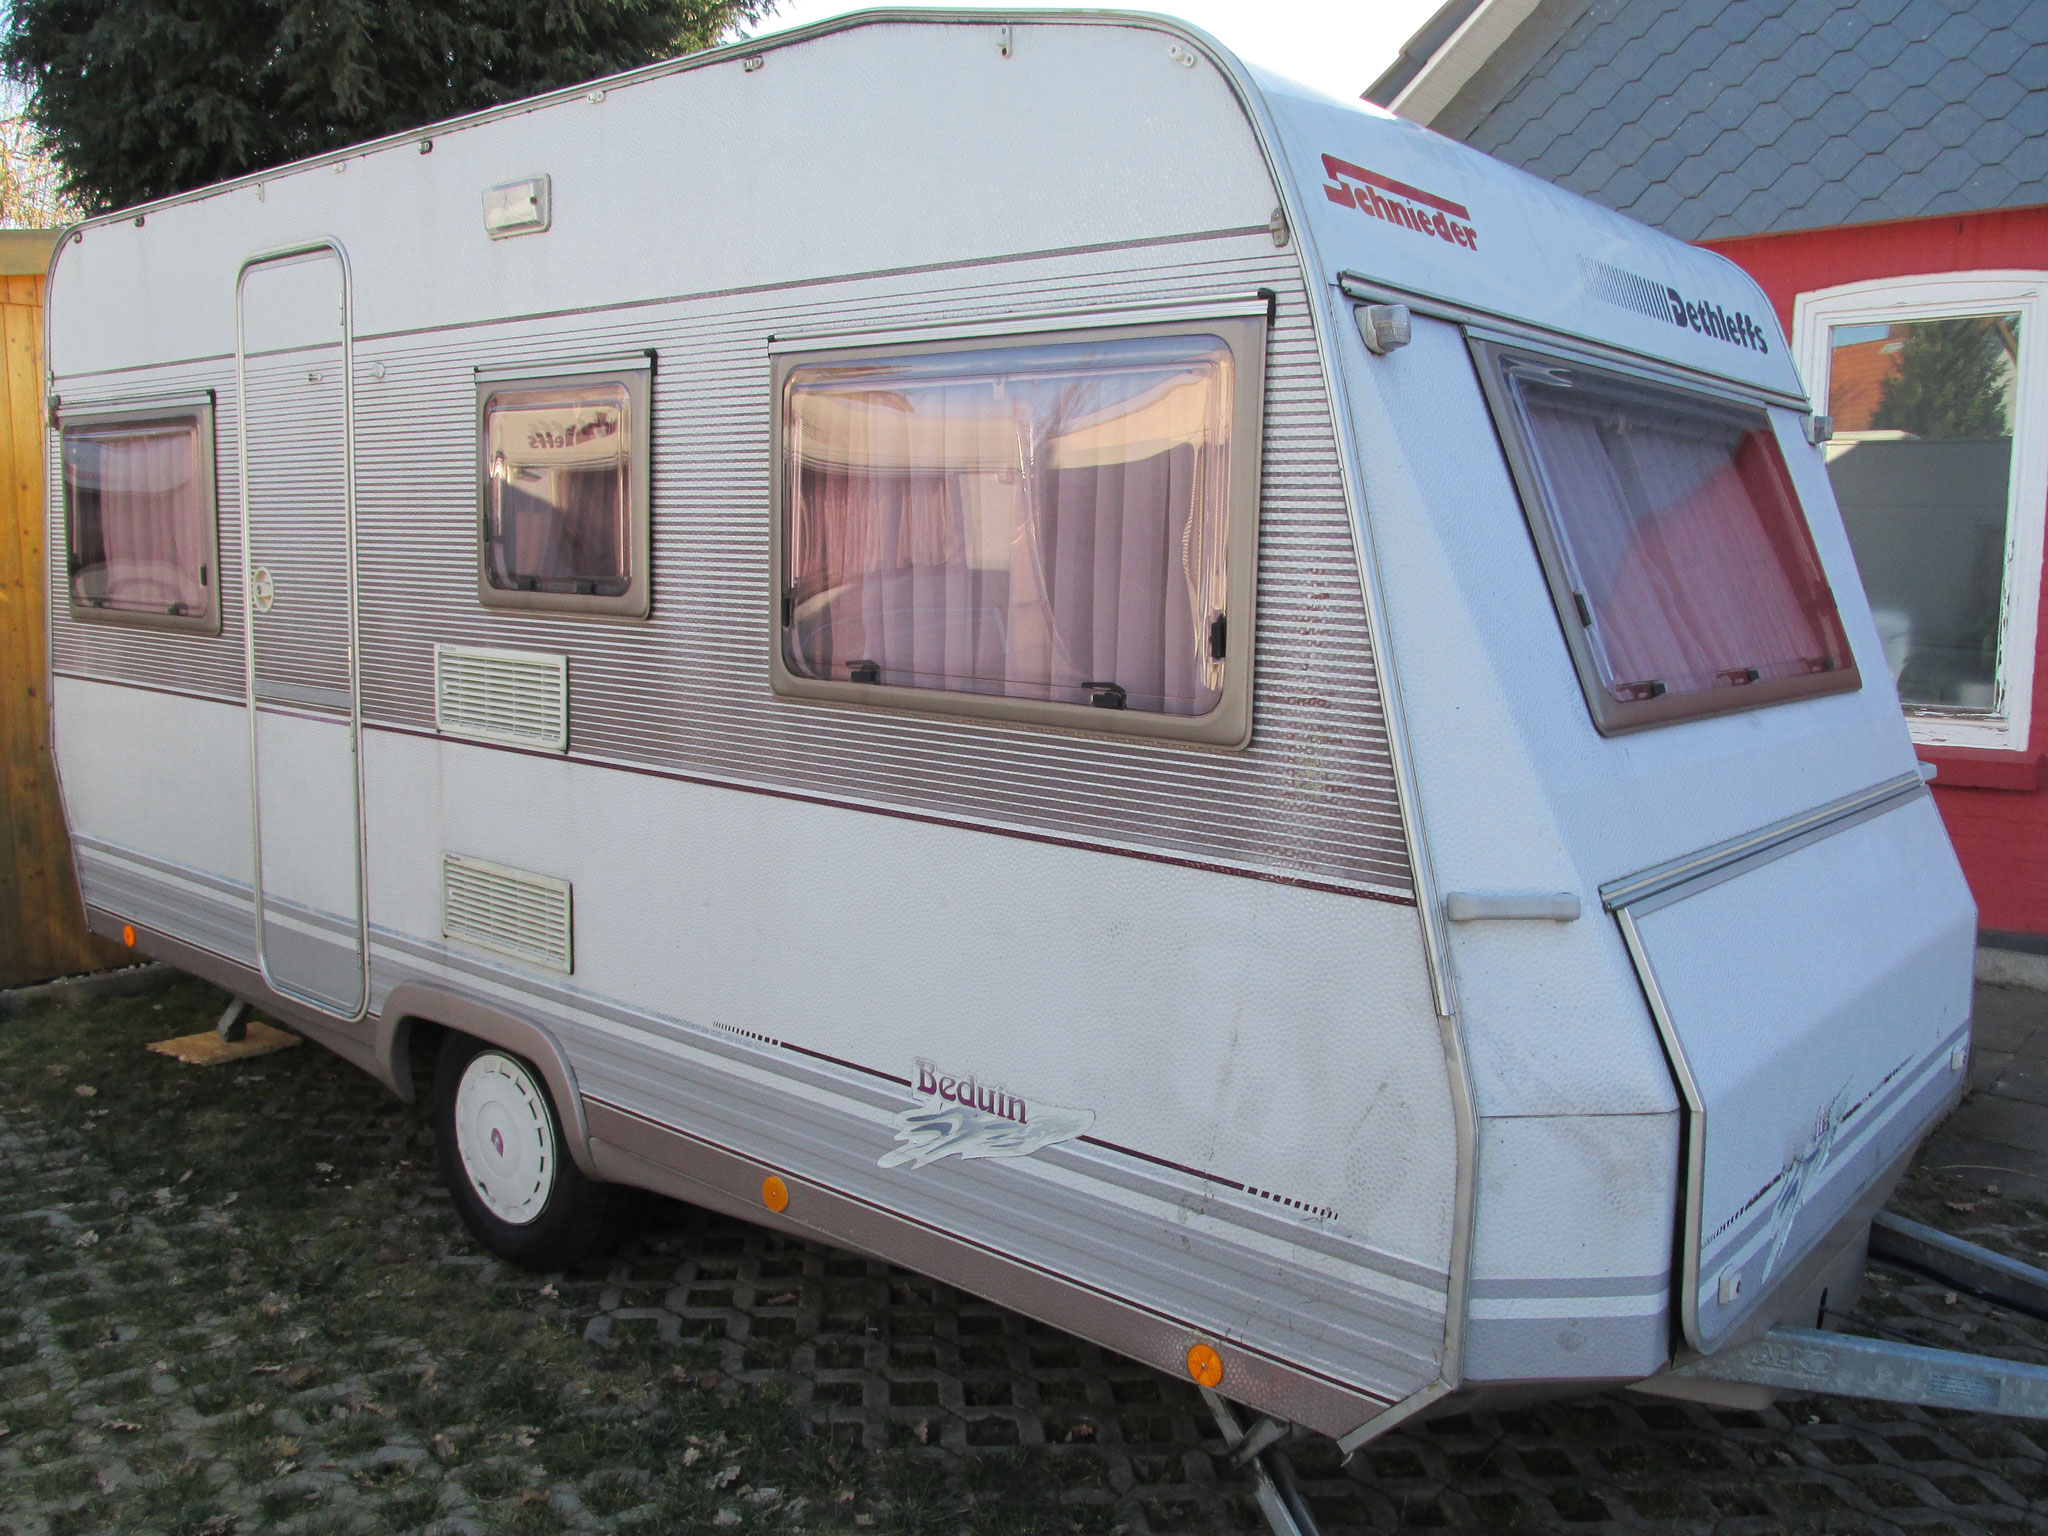 dethleffs beduin 460 t camping vermietung. Black Bedroom Furniture Sets. Home Design Ideas